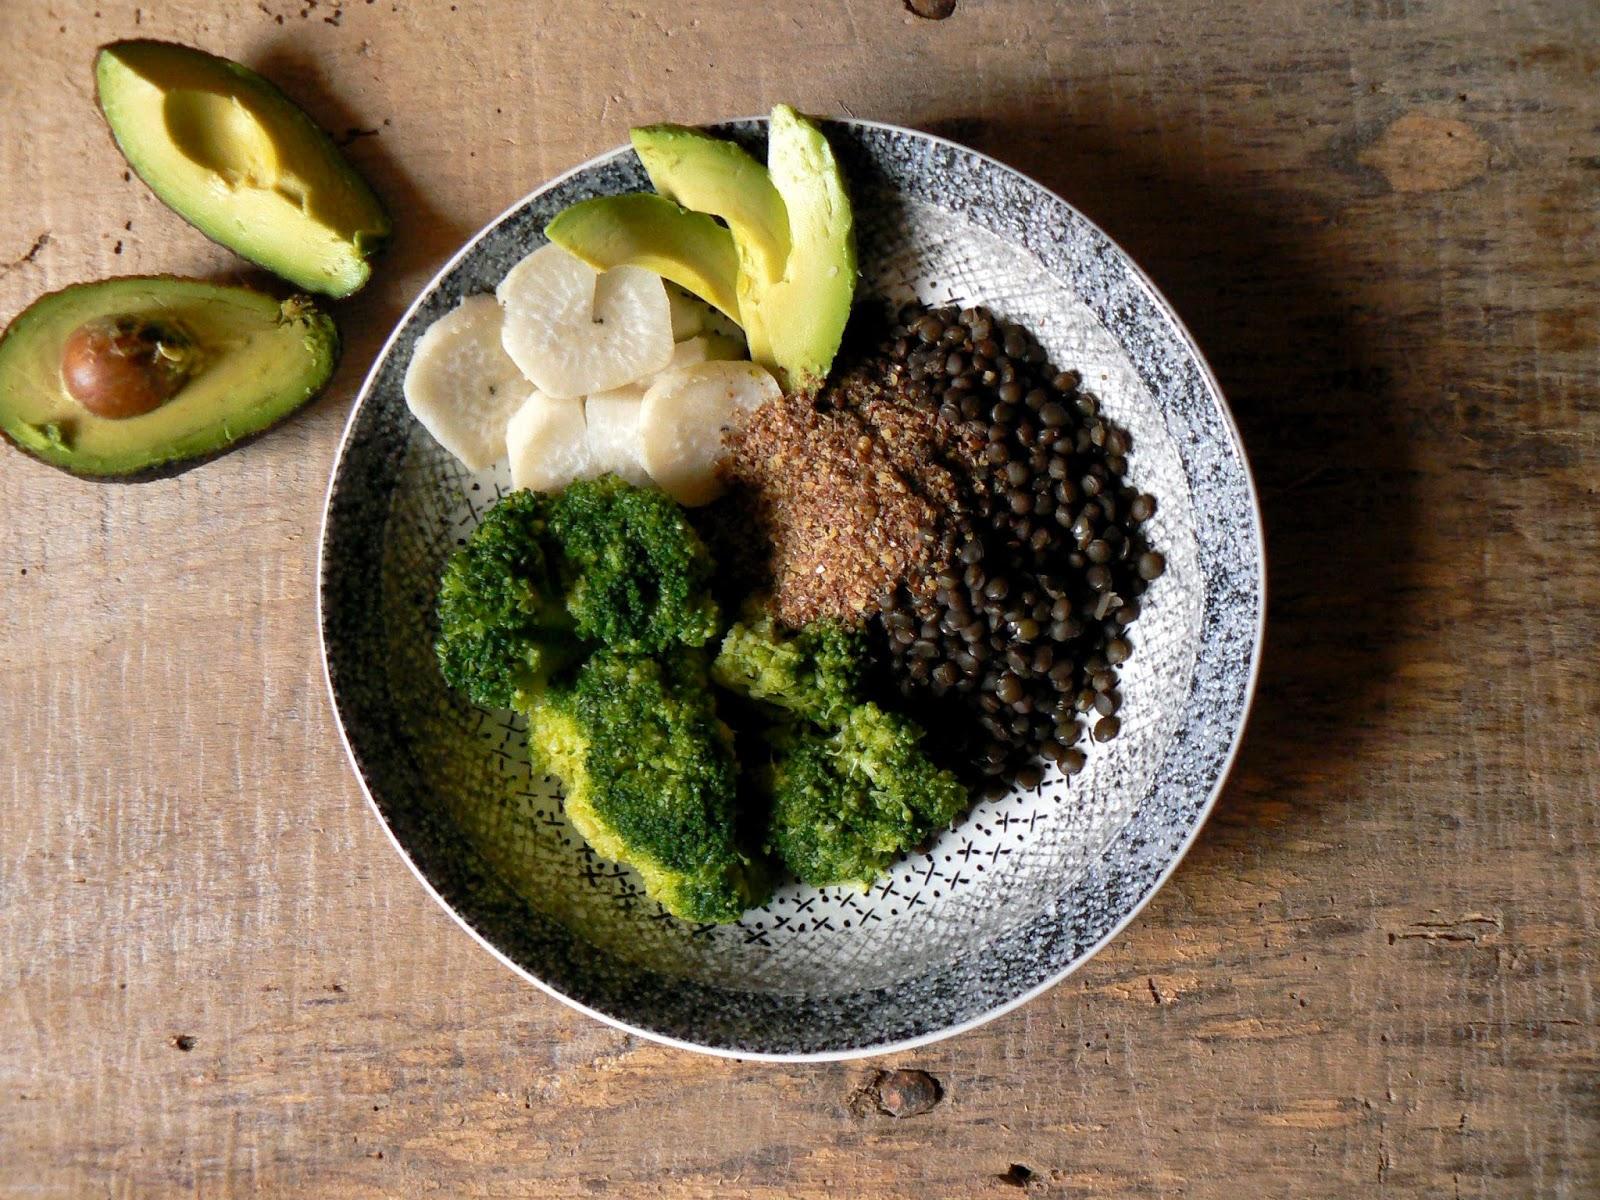 Recette naturo: Plat vegetarien